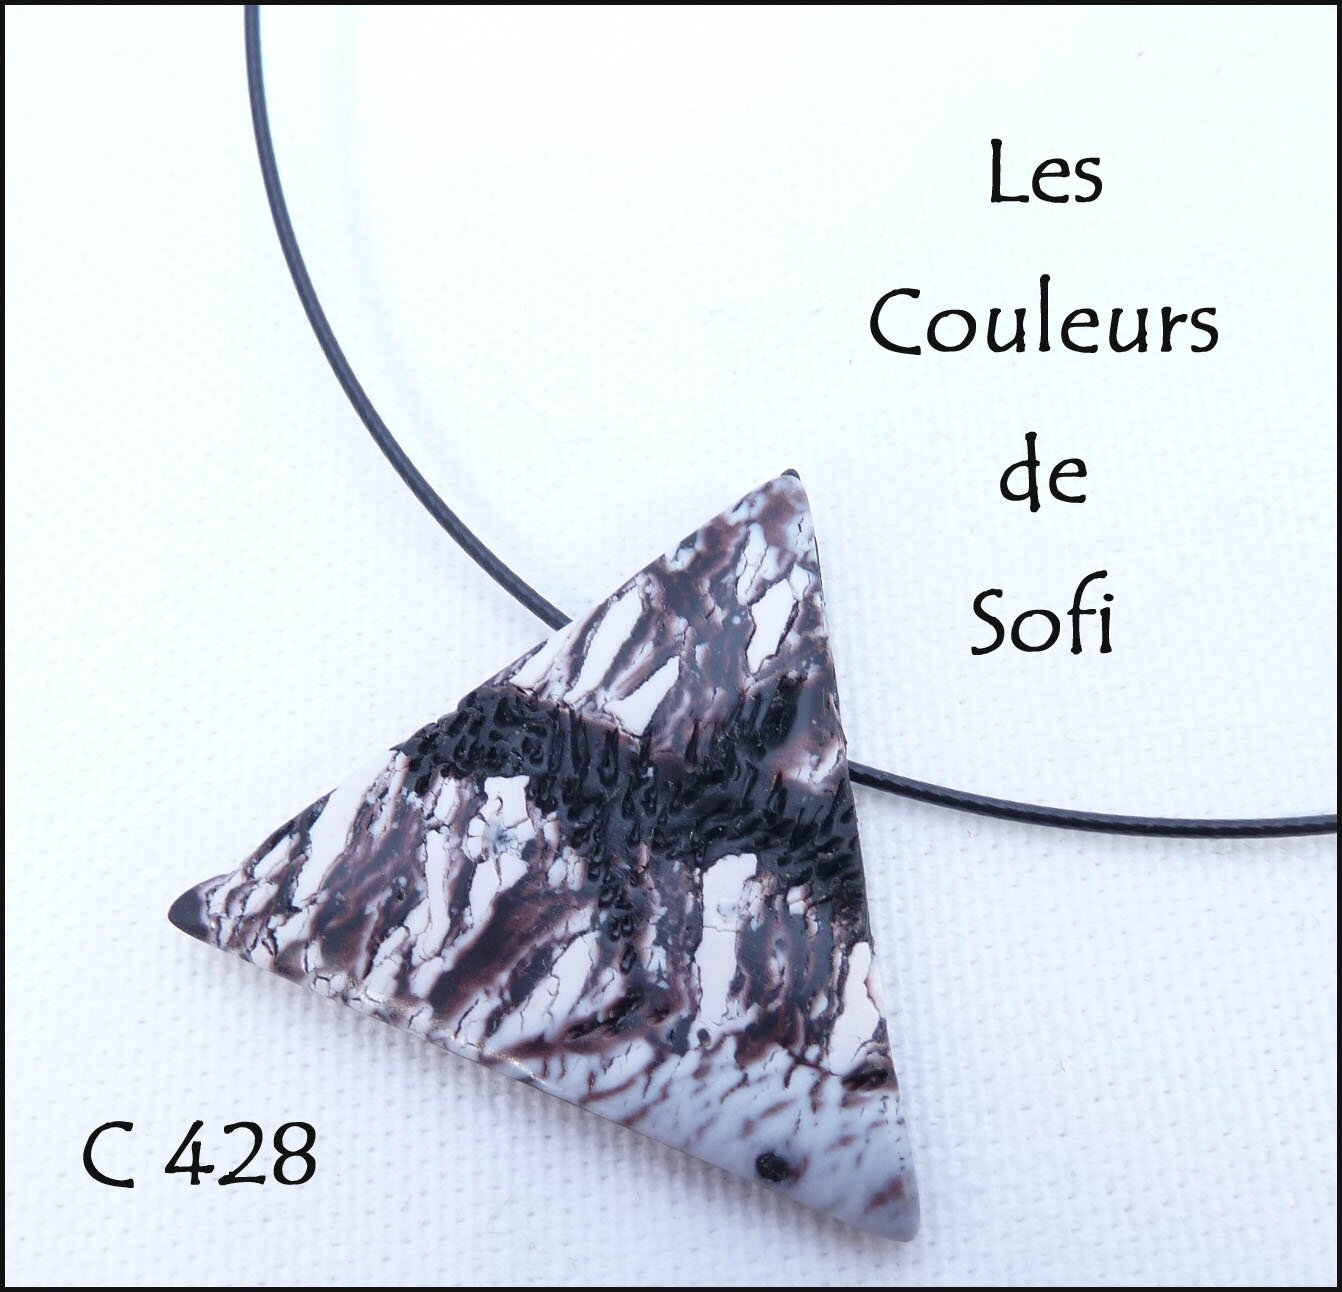 C 428